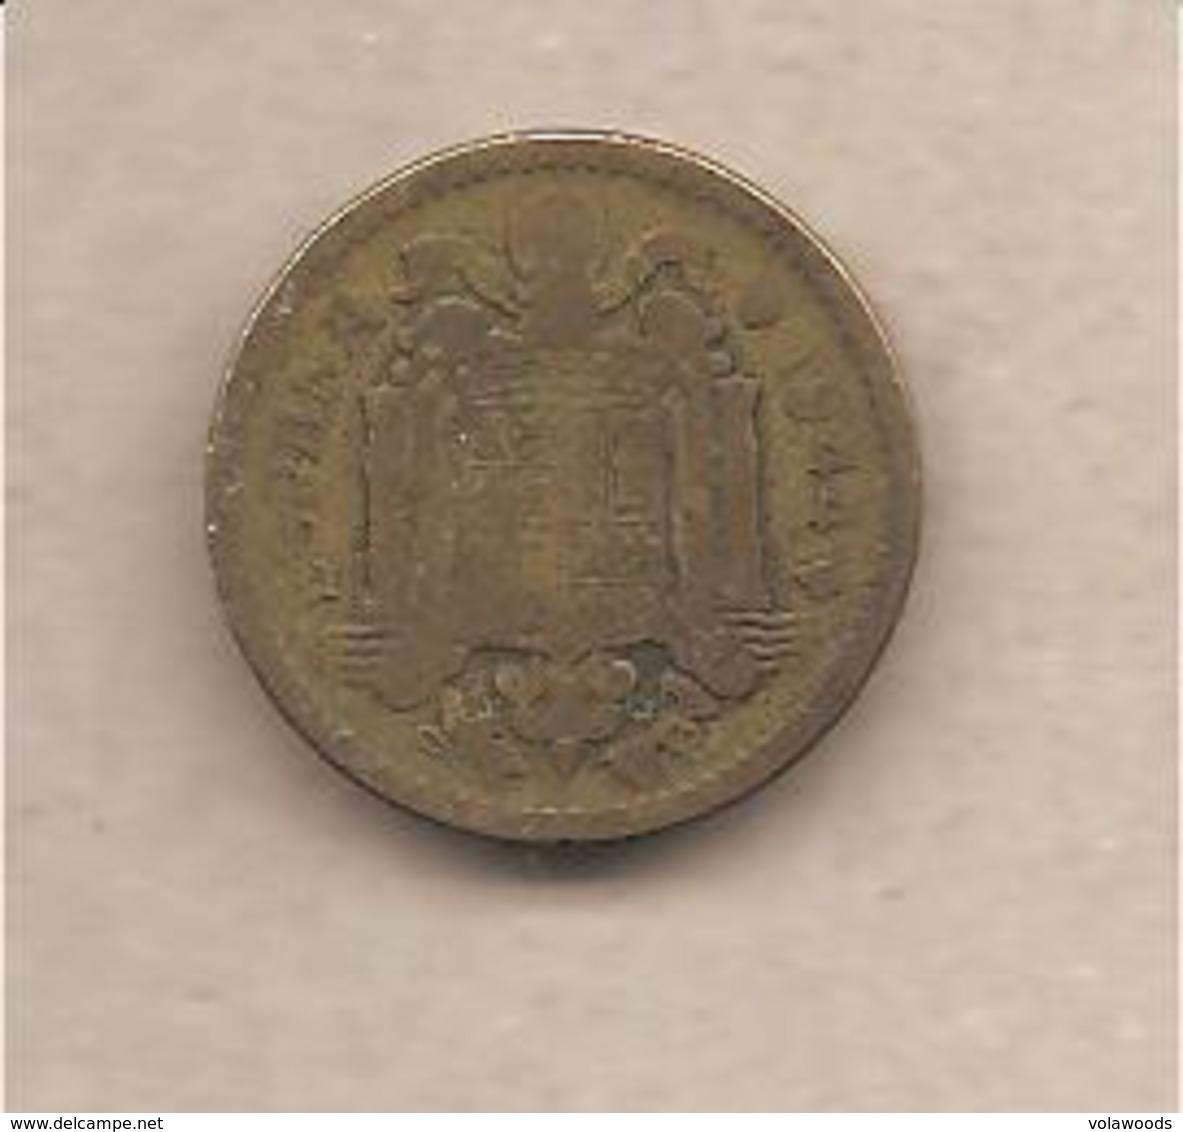 Spagna - Moneta Circolata Da 1 Peseta - 1944 - 1 Peseta